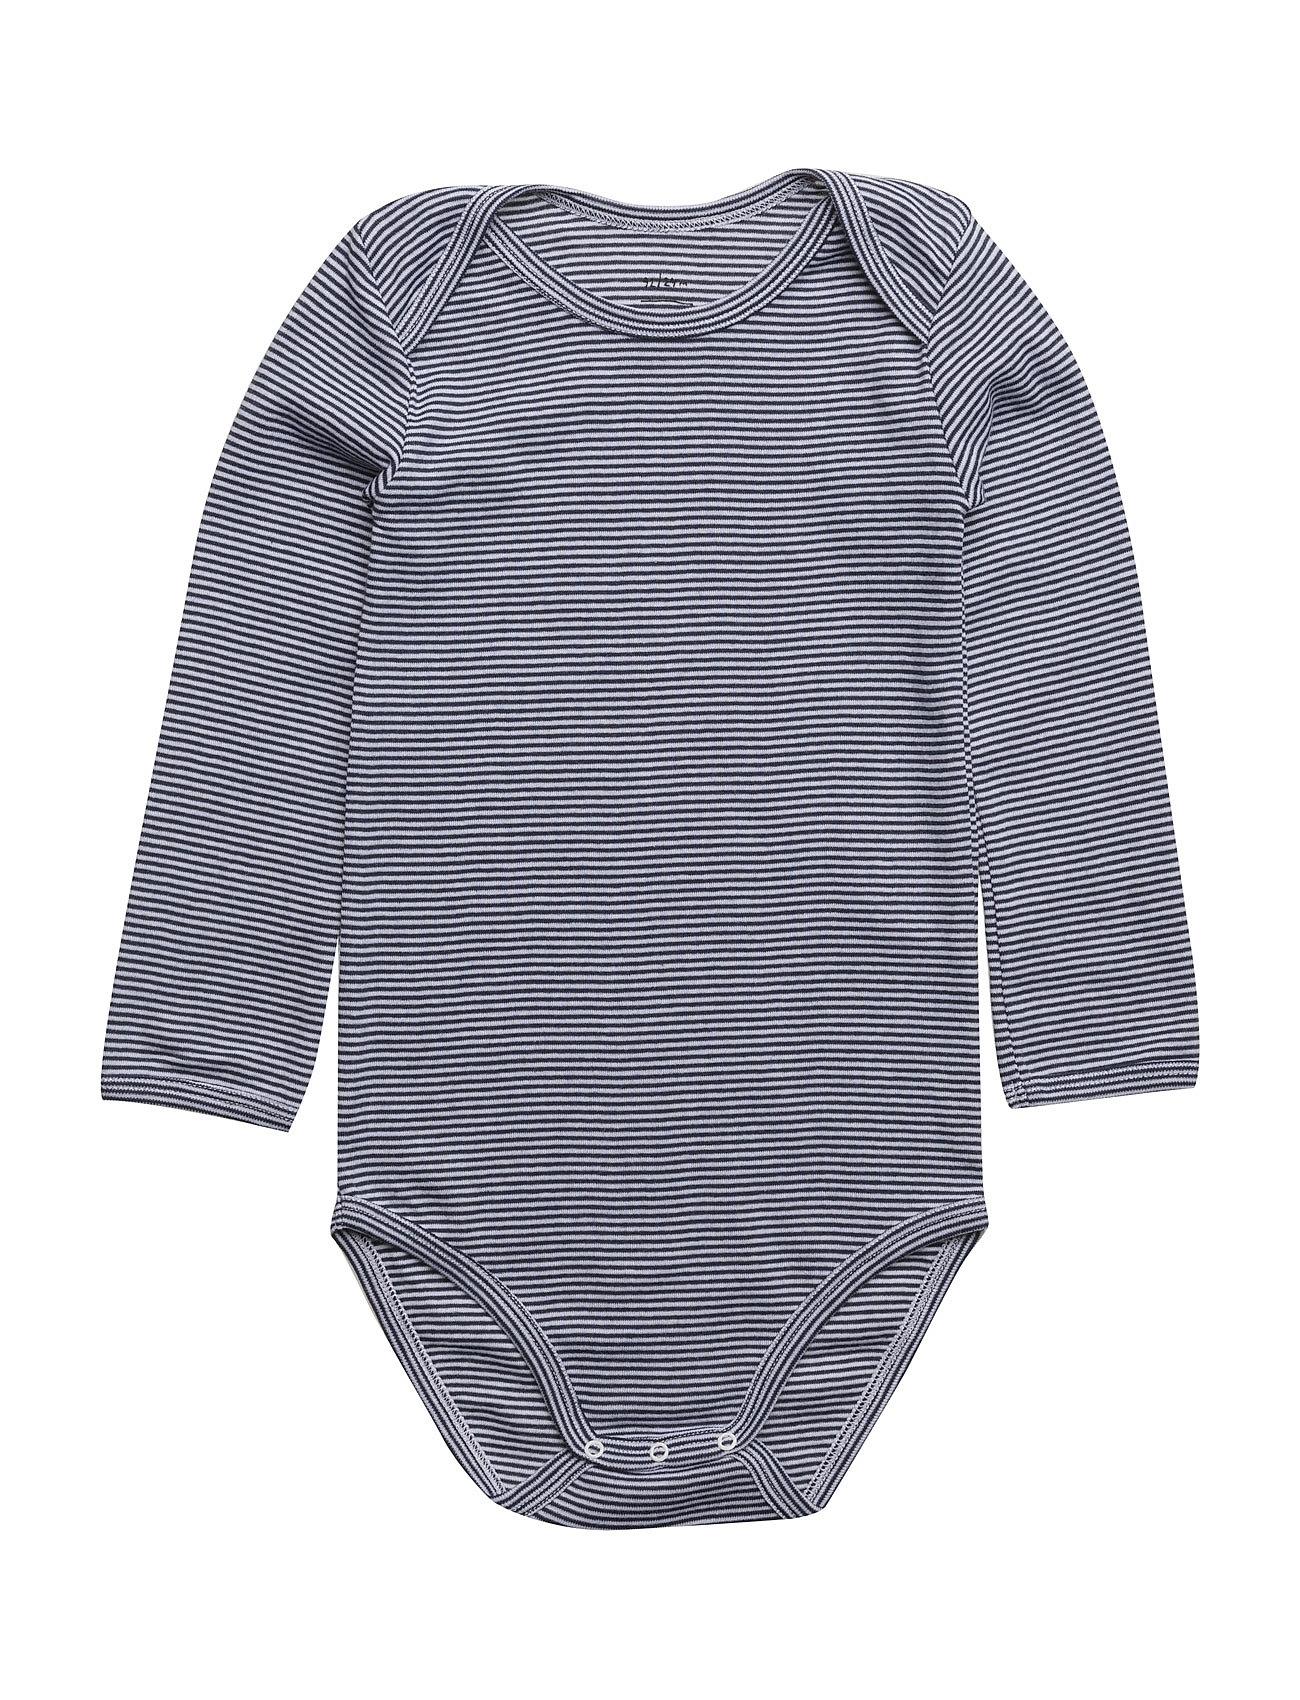 noa noa miniature Baby body fra boozt.com dk